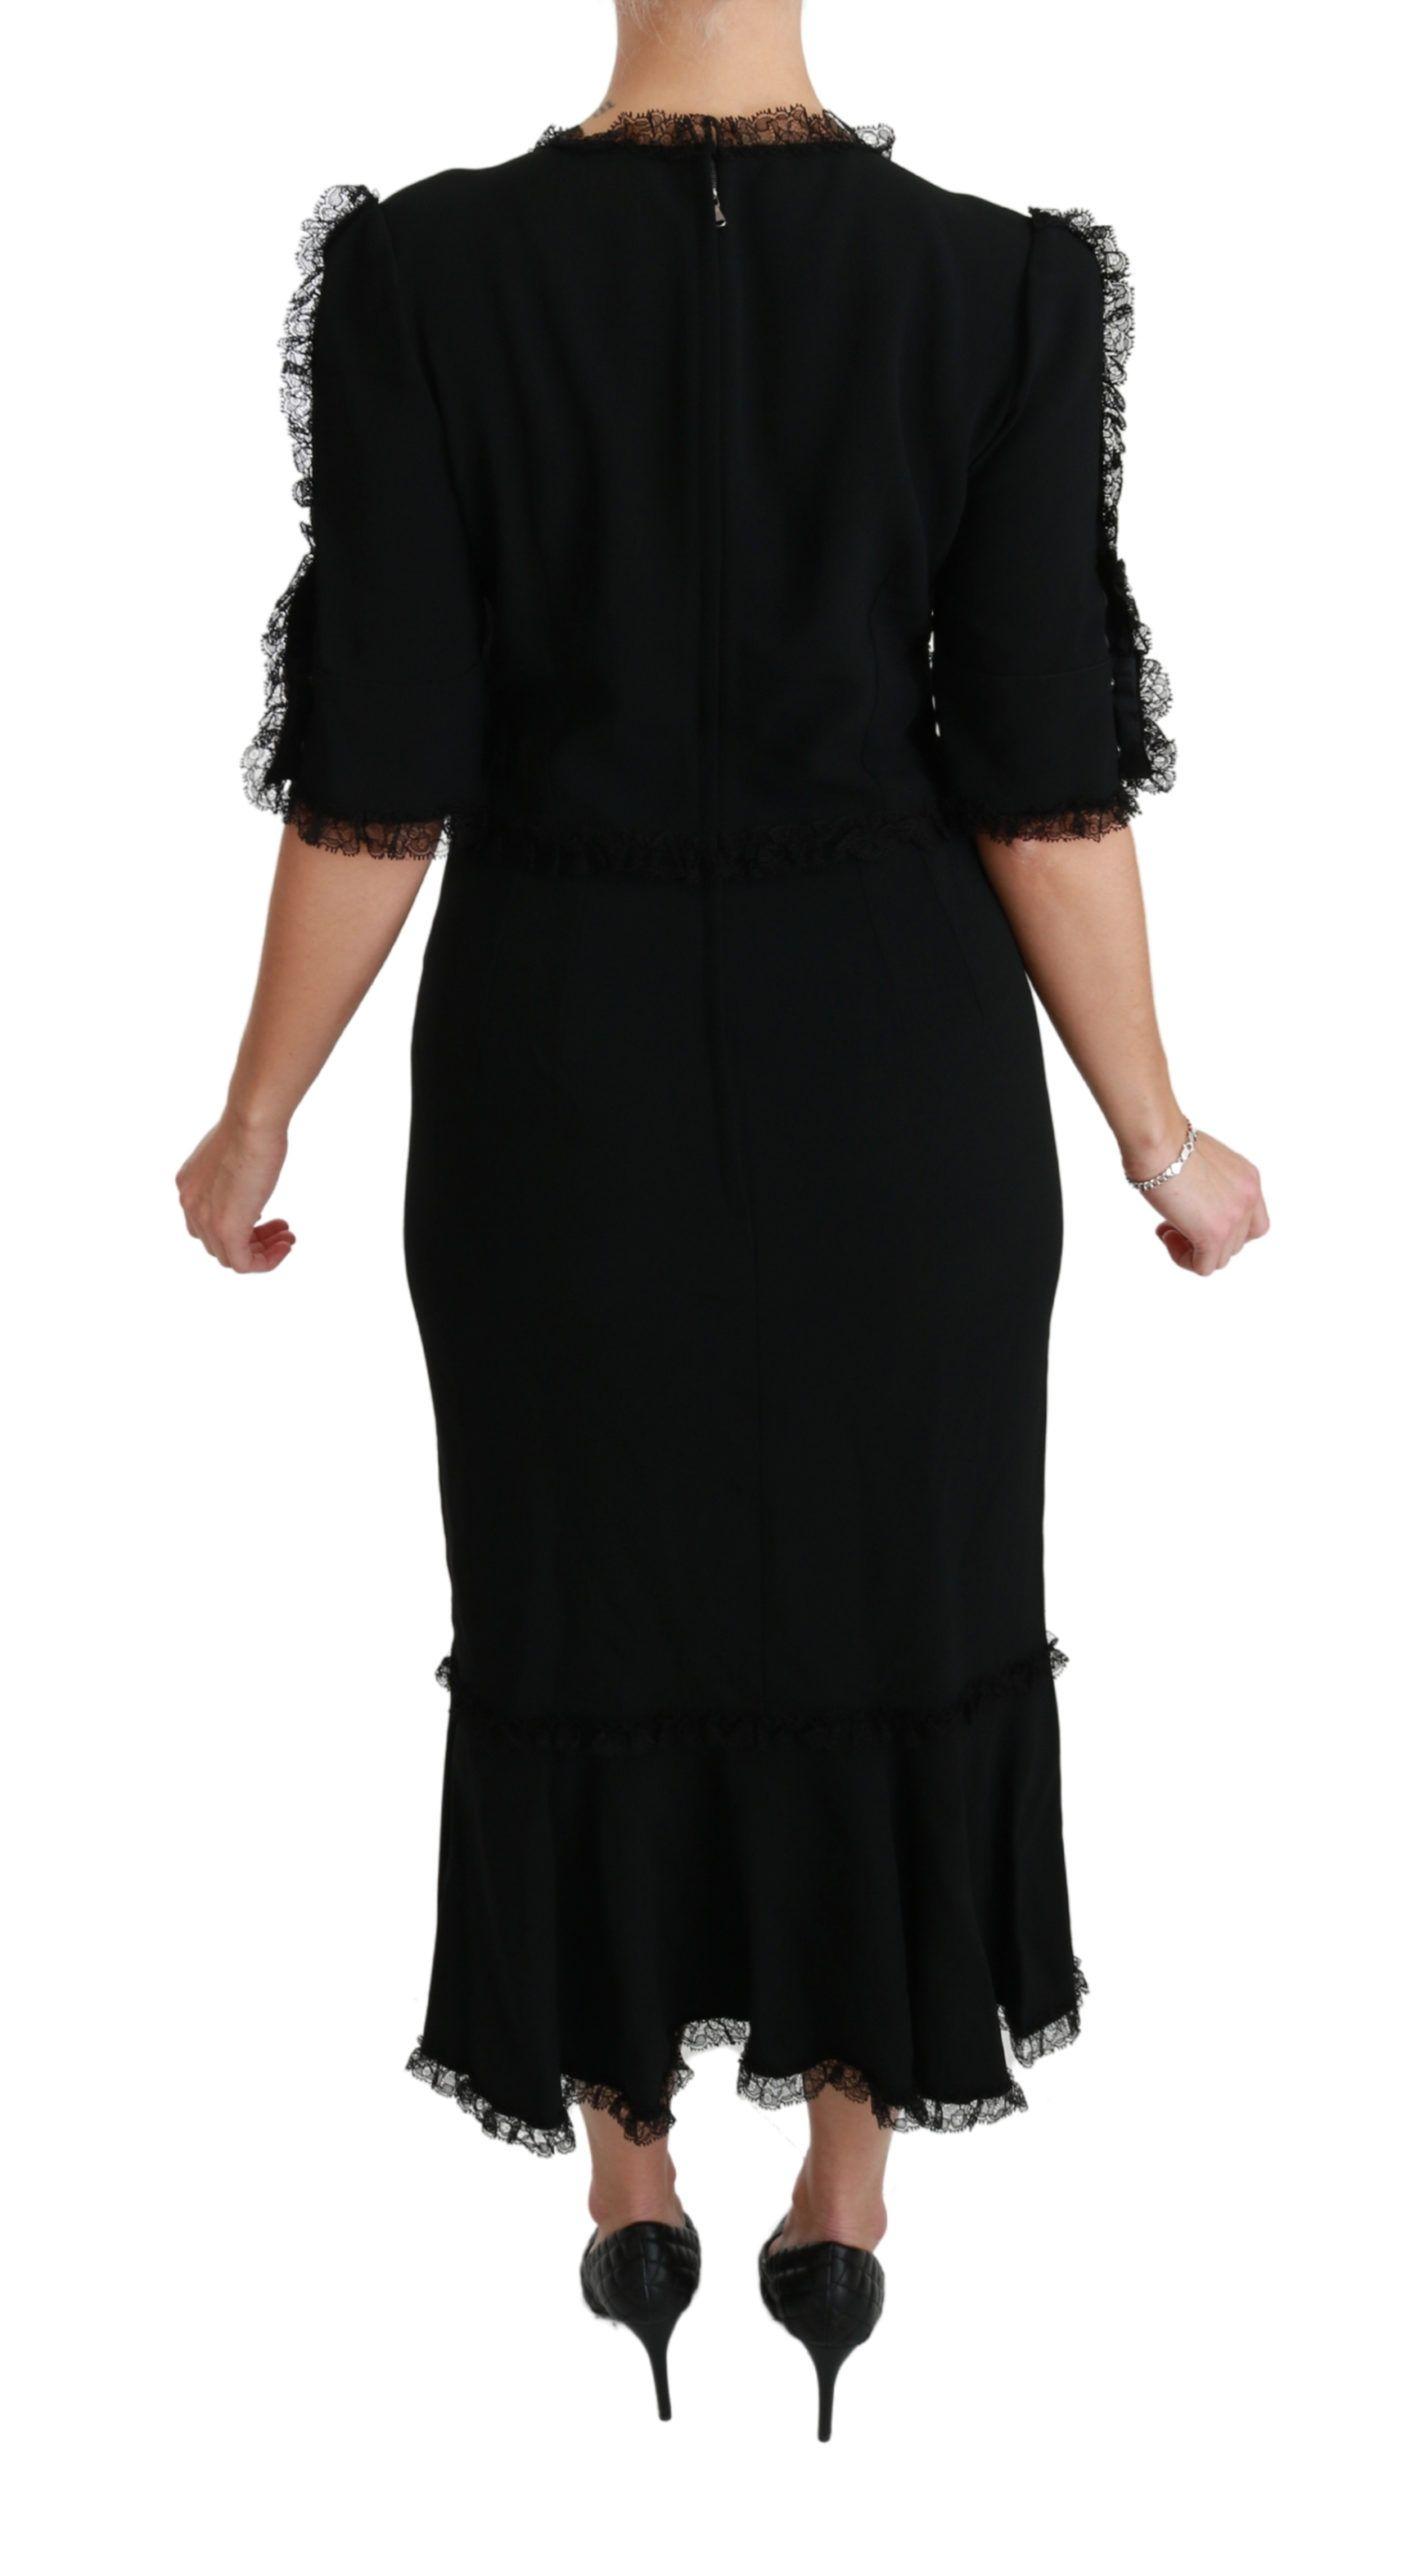 Dolce & Gabbana Black Lace Shift Leopard Head Button Dress